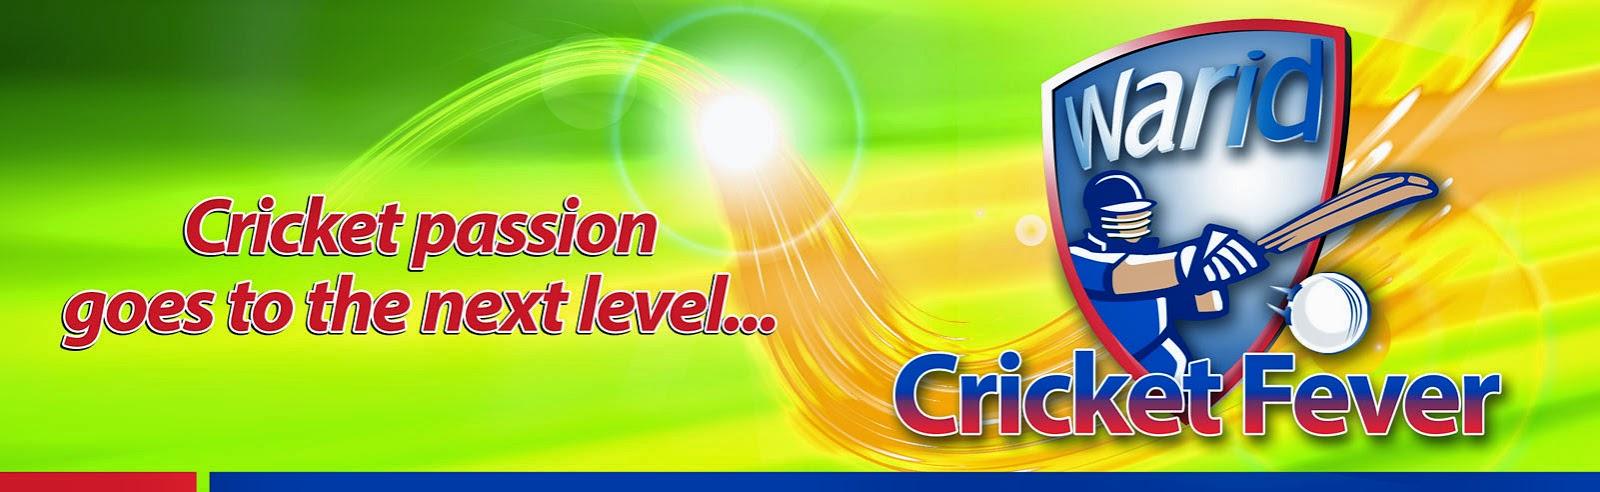 Warid Cricket Fever 2015